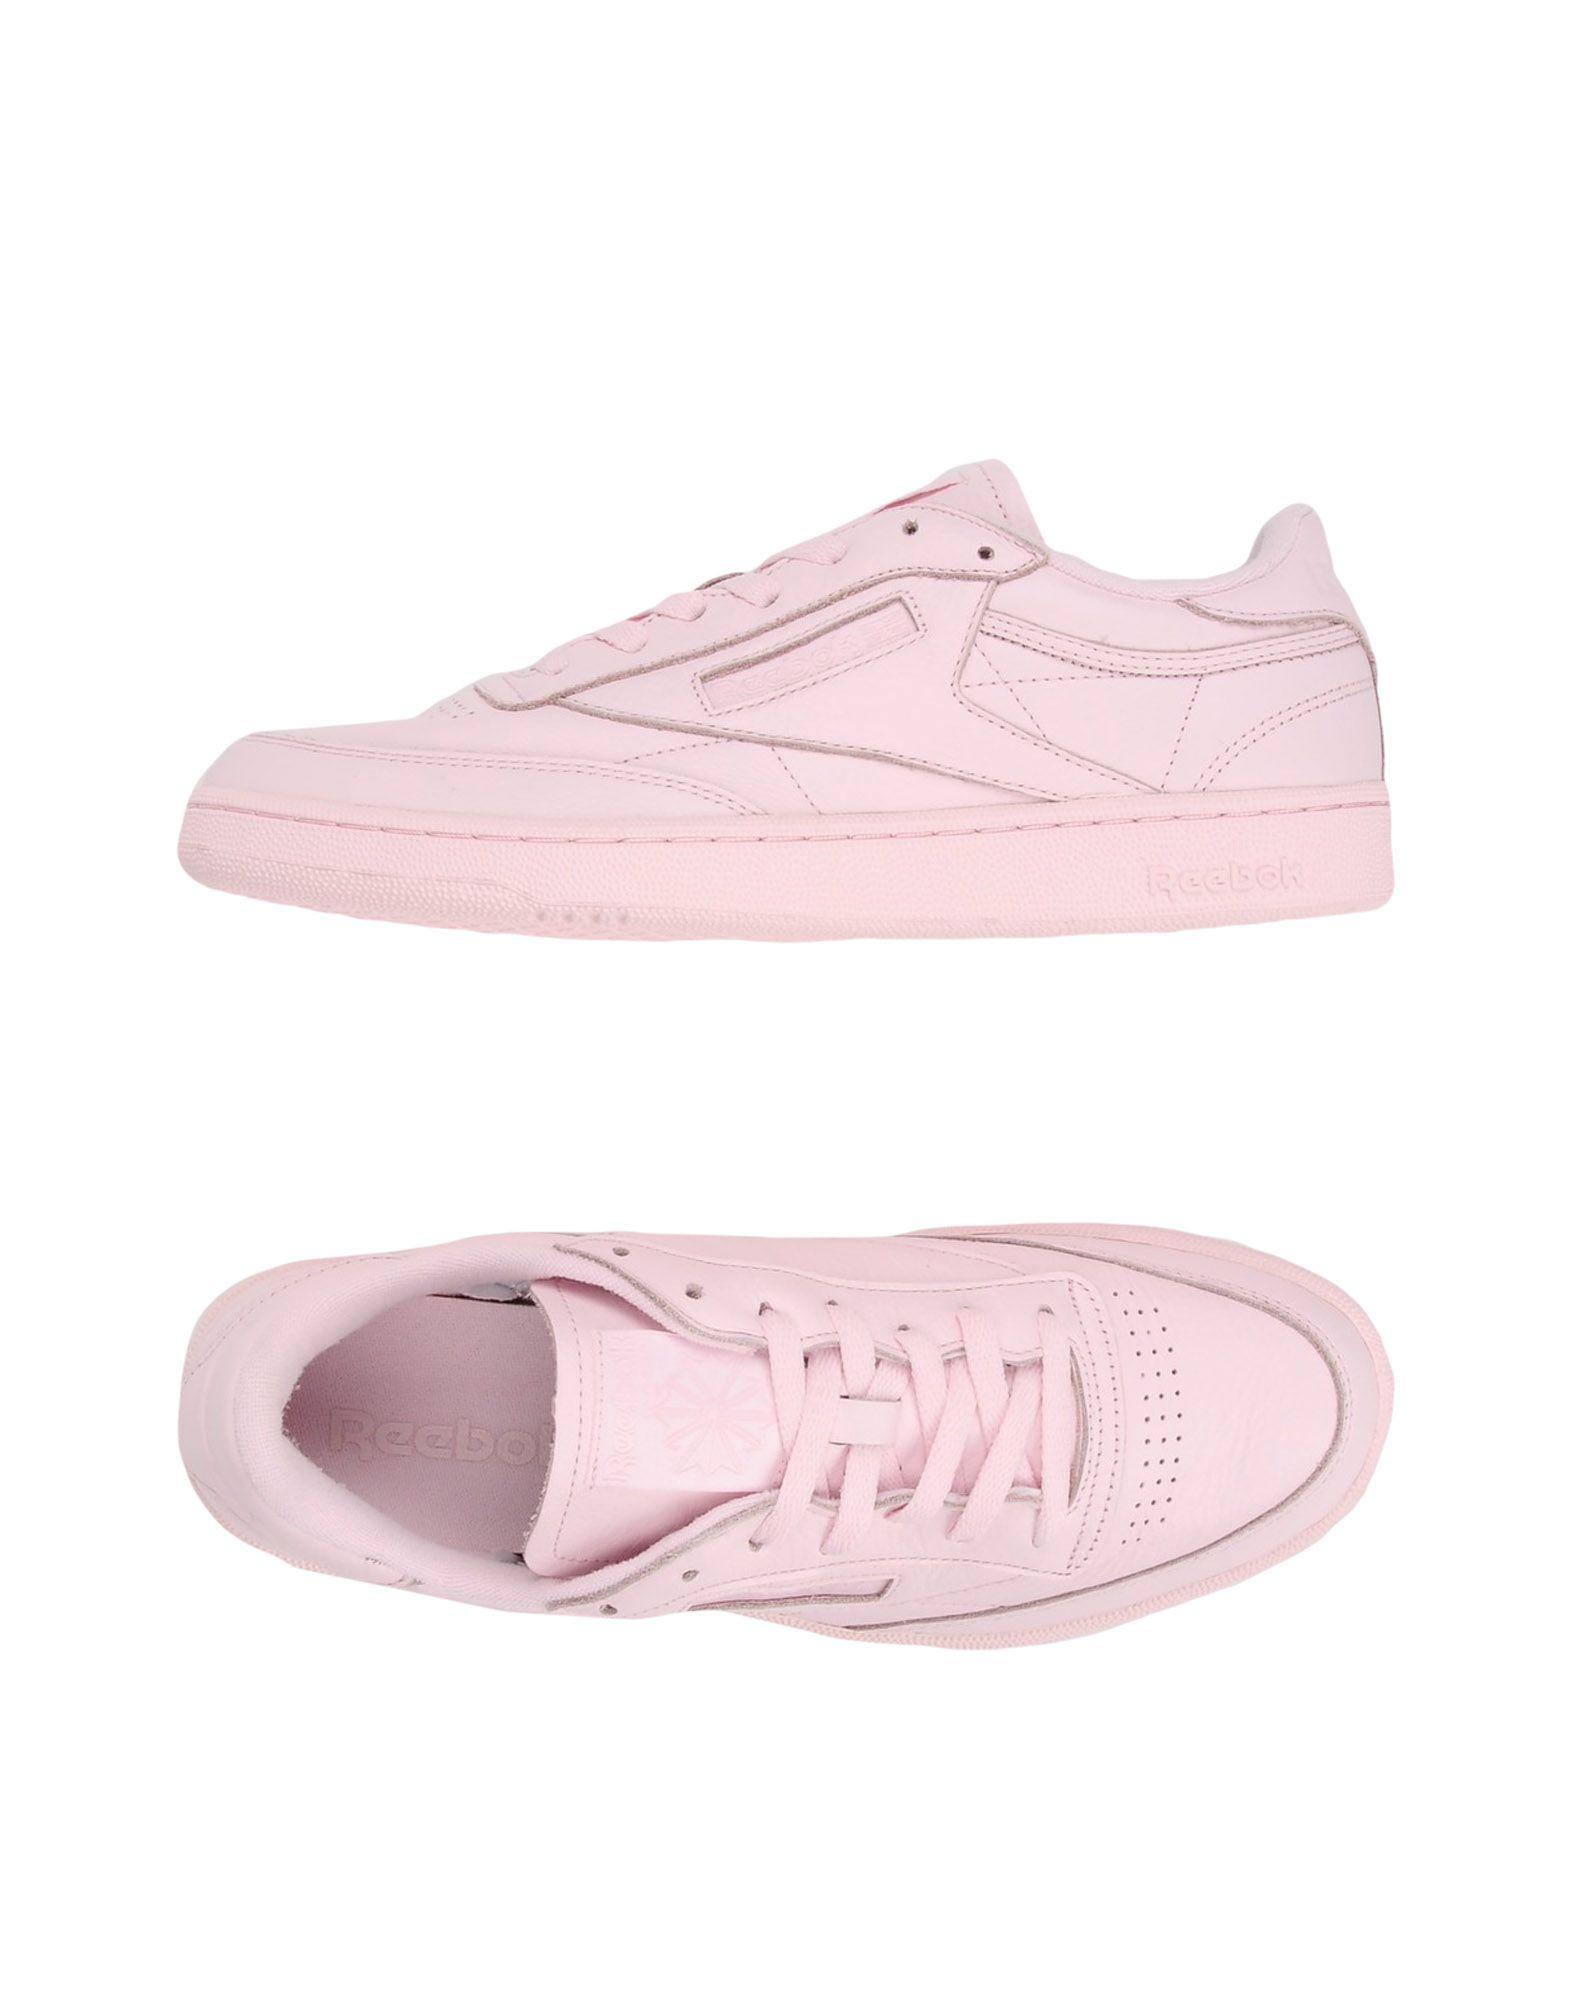 Sneakers Reebok Club C 85 Elm - Uomo - 11307493BM